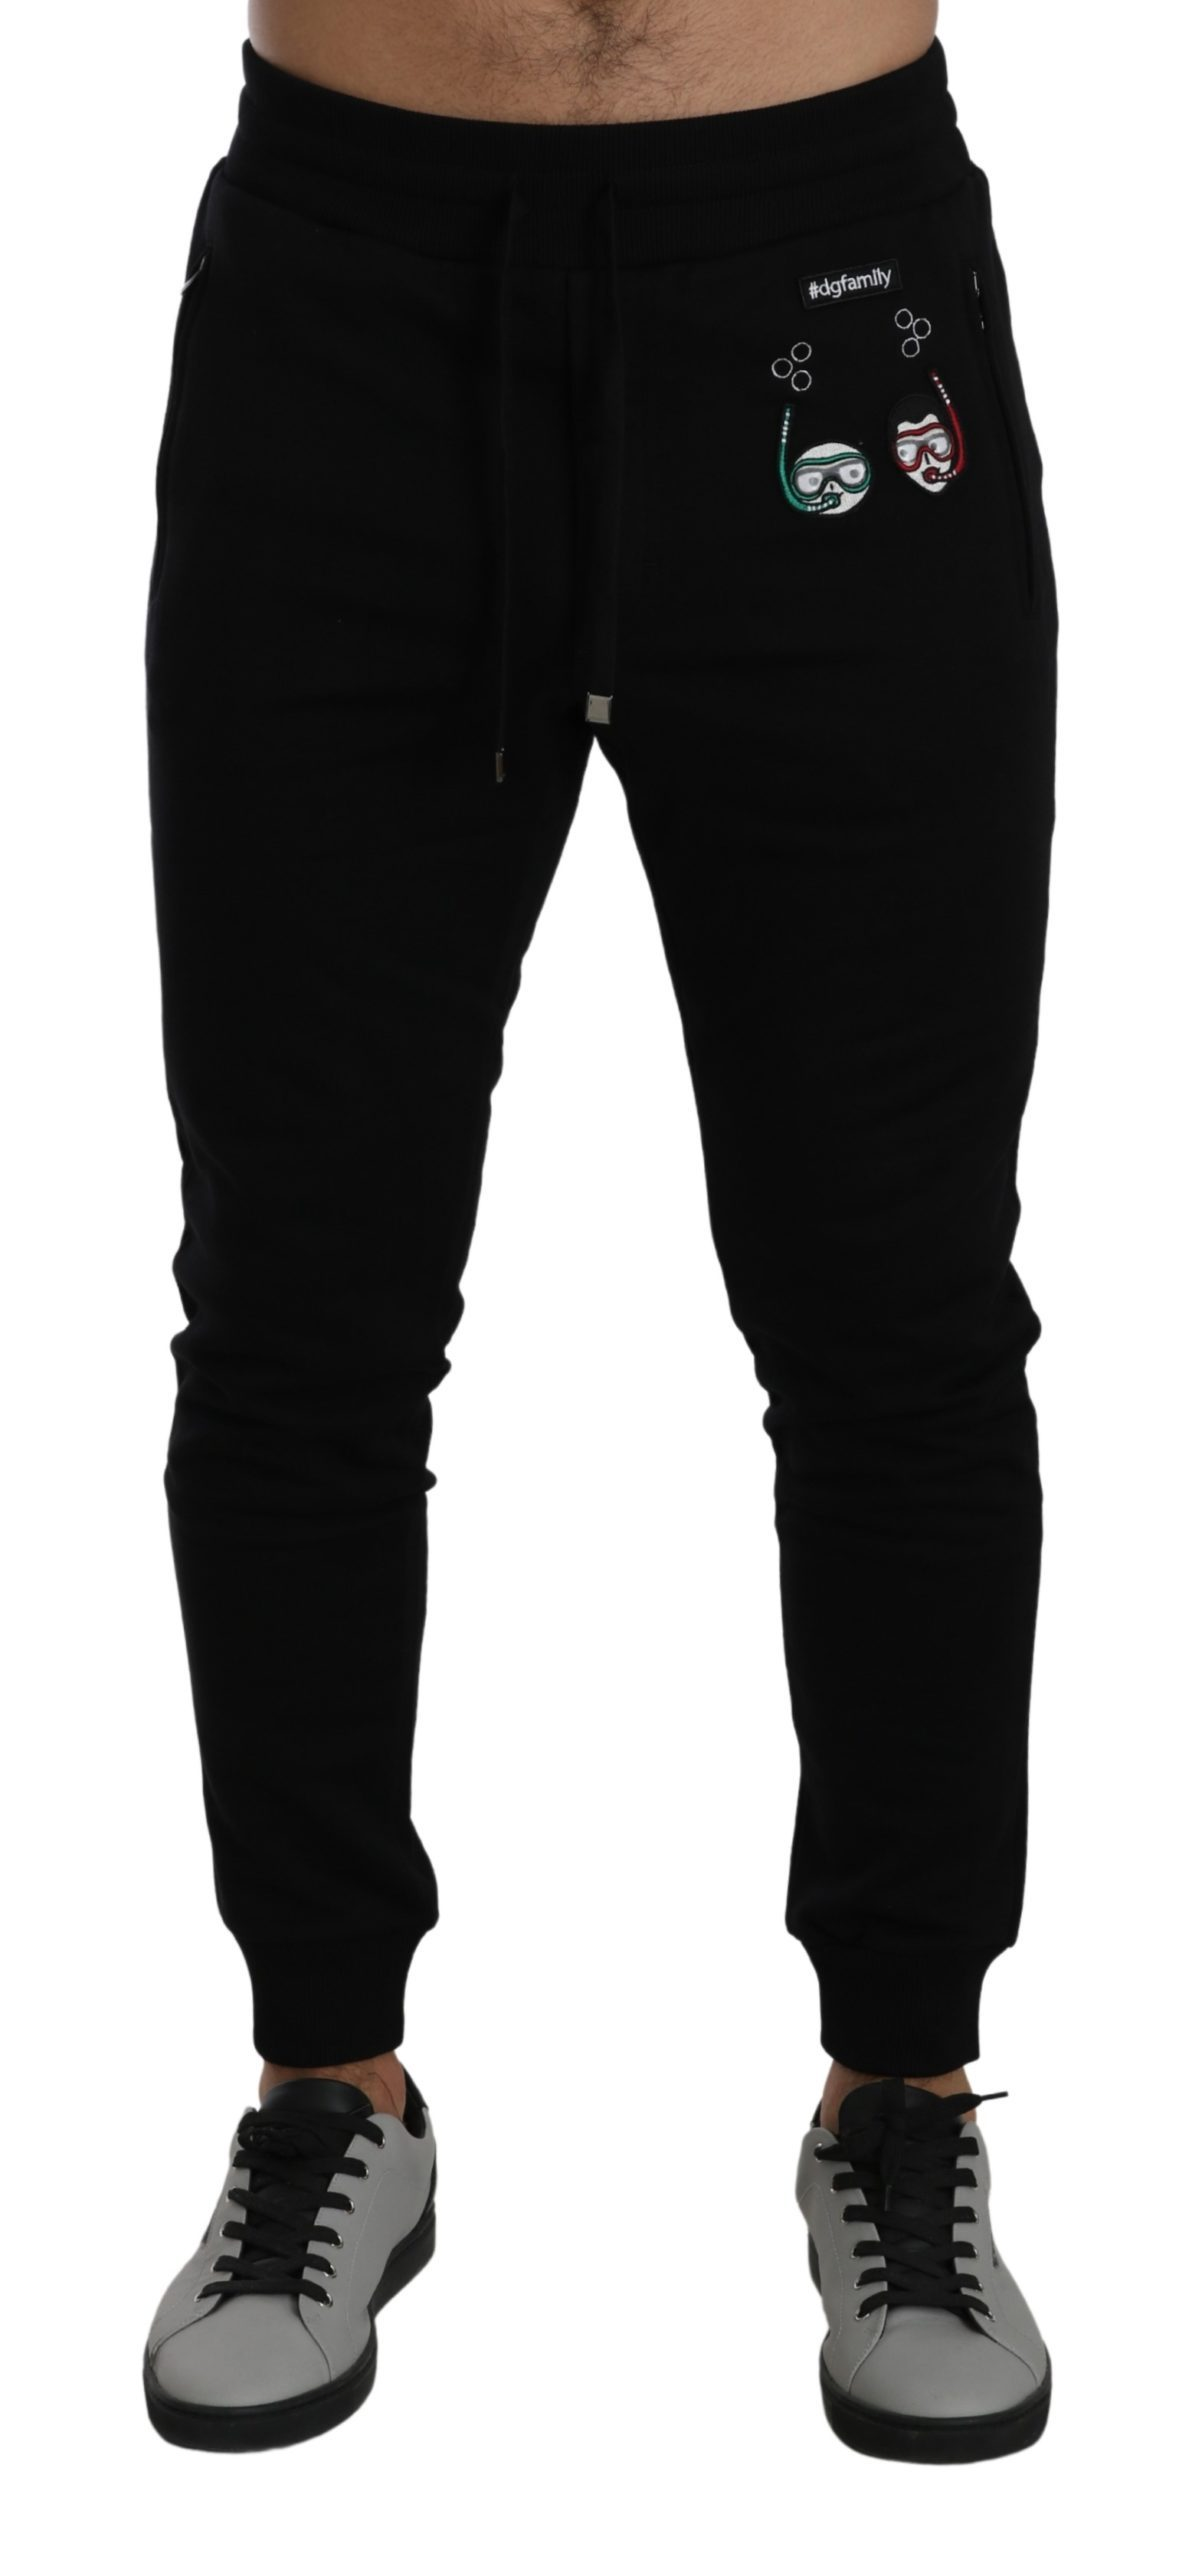 Dolce & Gabbana Men's Jogging Cotton Trouser Black PAN71425 - IT46 | S